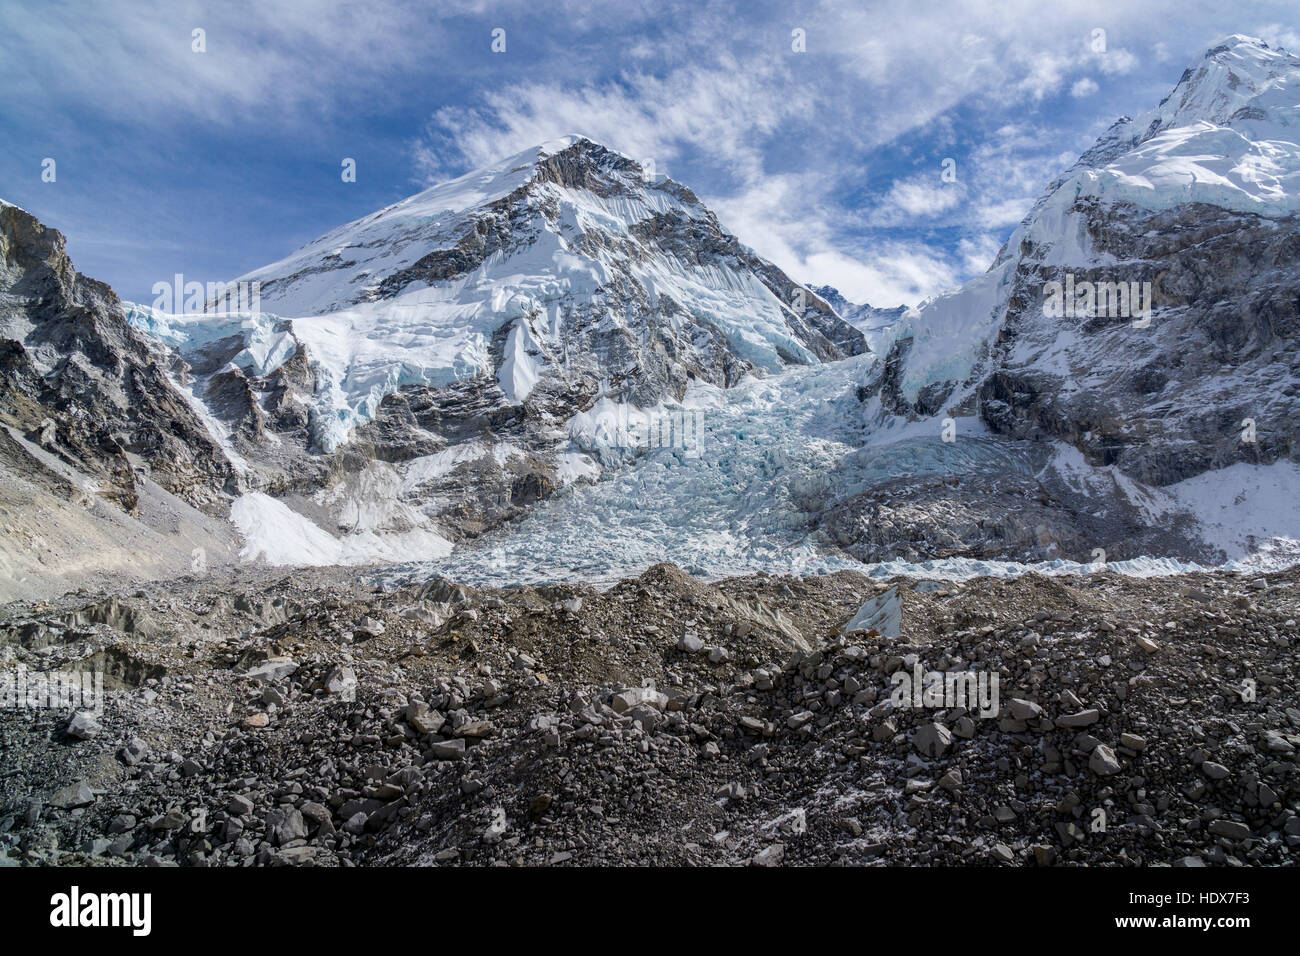 Blick über den Gletscher auf den kumbhu kumbhu Eisfall, der Berg khumbutse (6665 m) hinter sich Stockbild